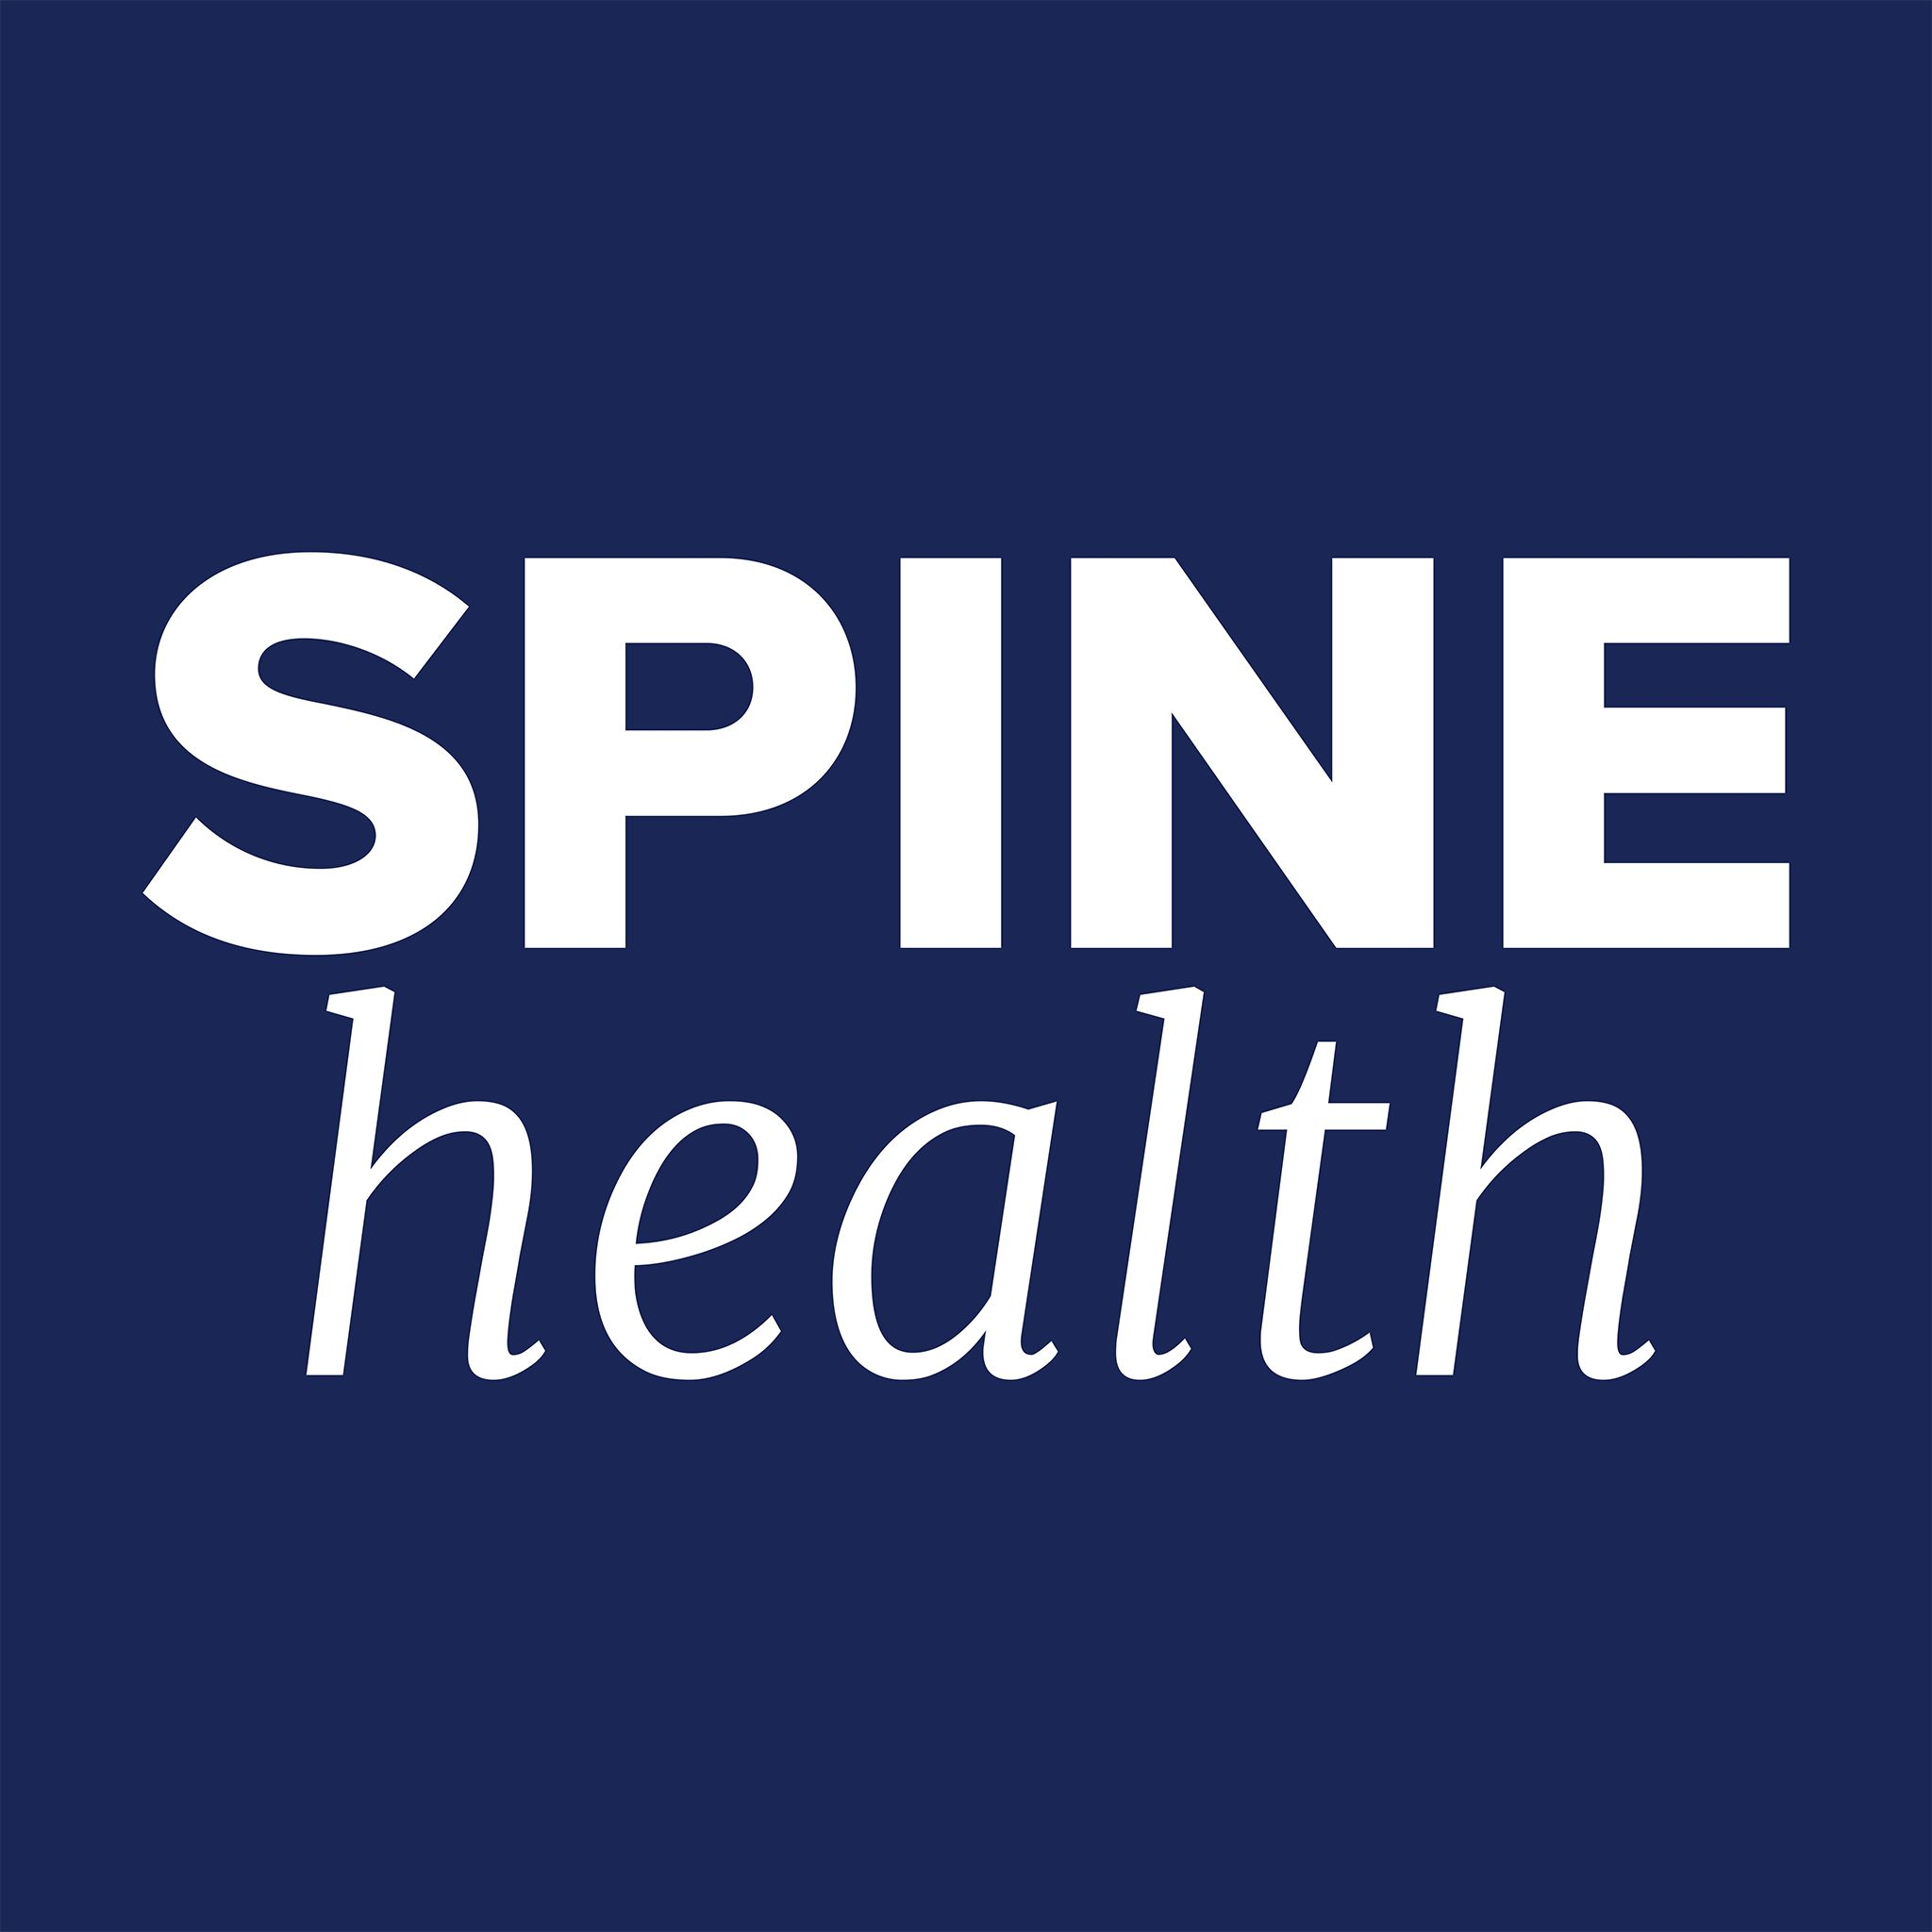 Spine-health